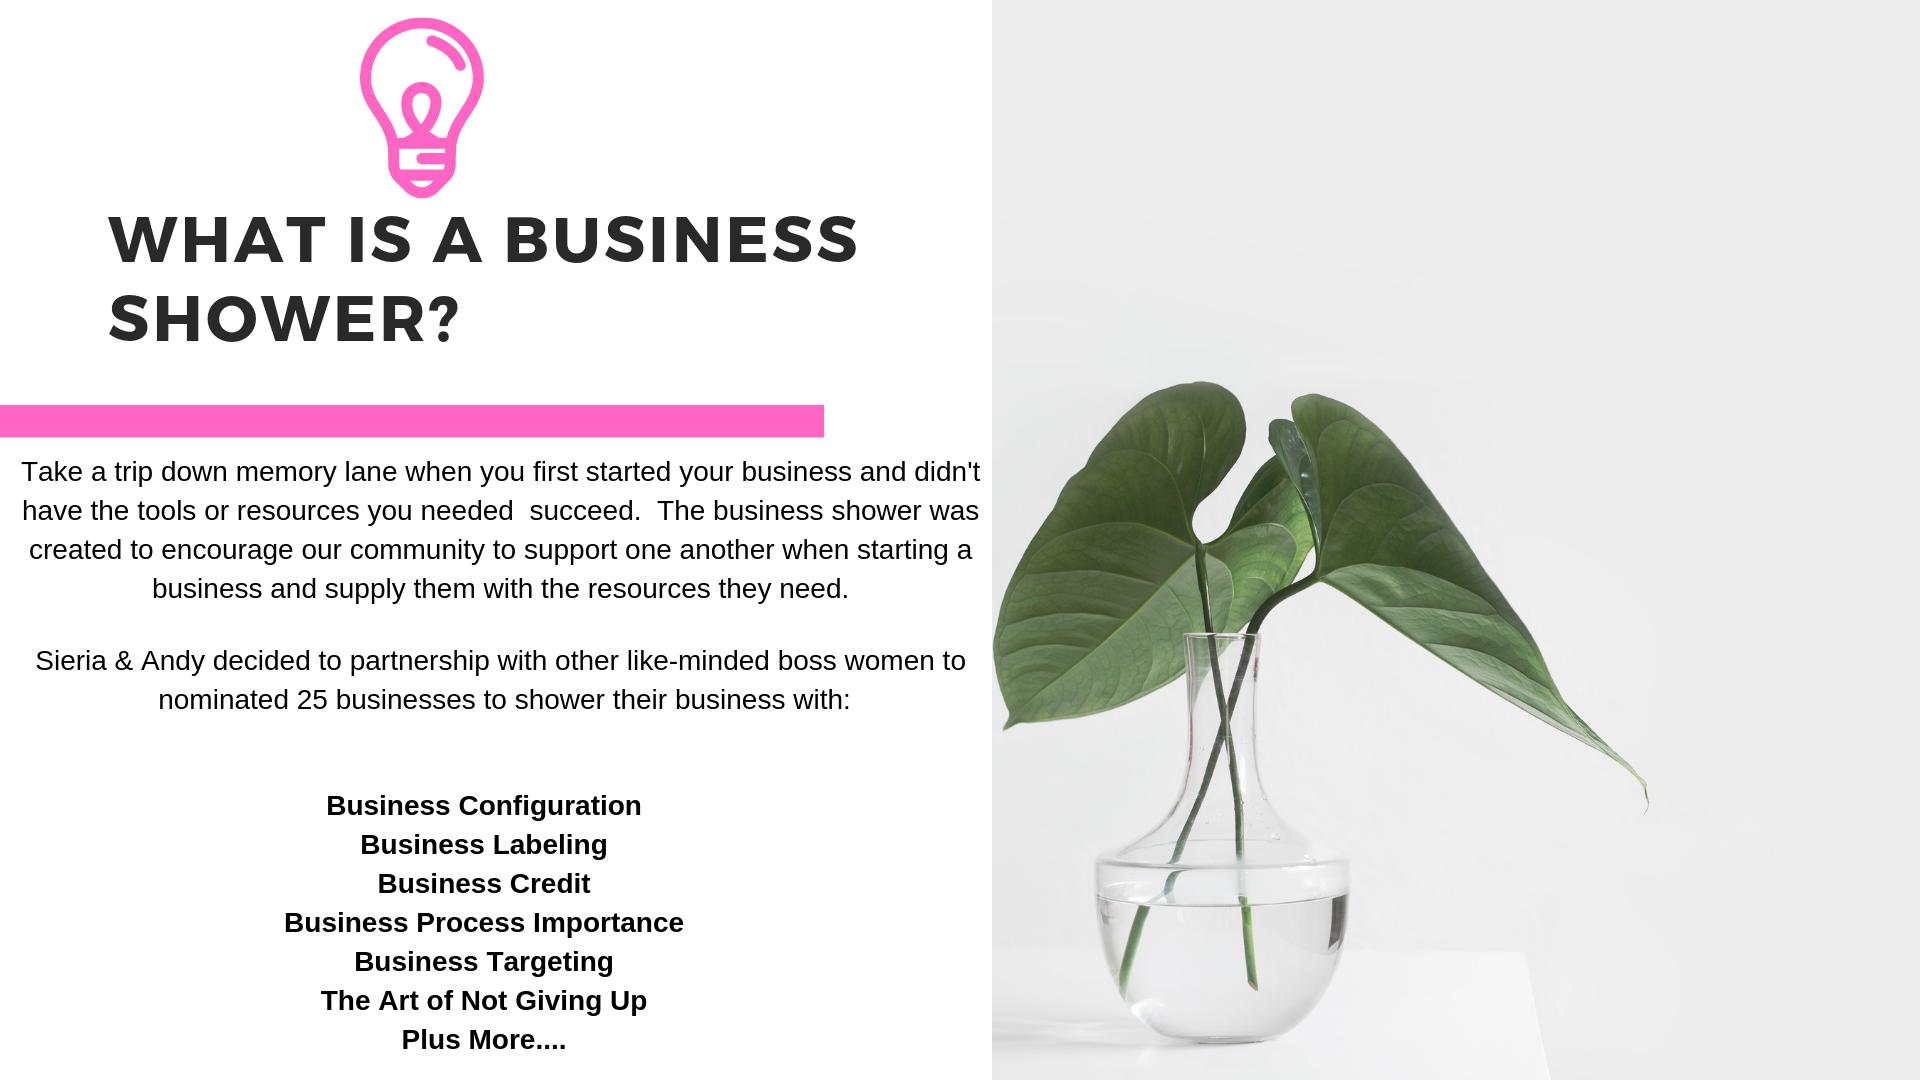 Business Shower Tour 2019 (Panelist) (2).png